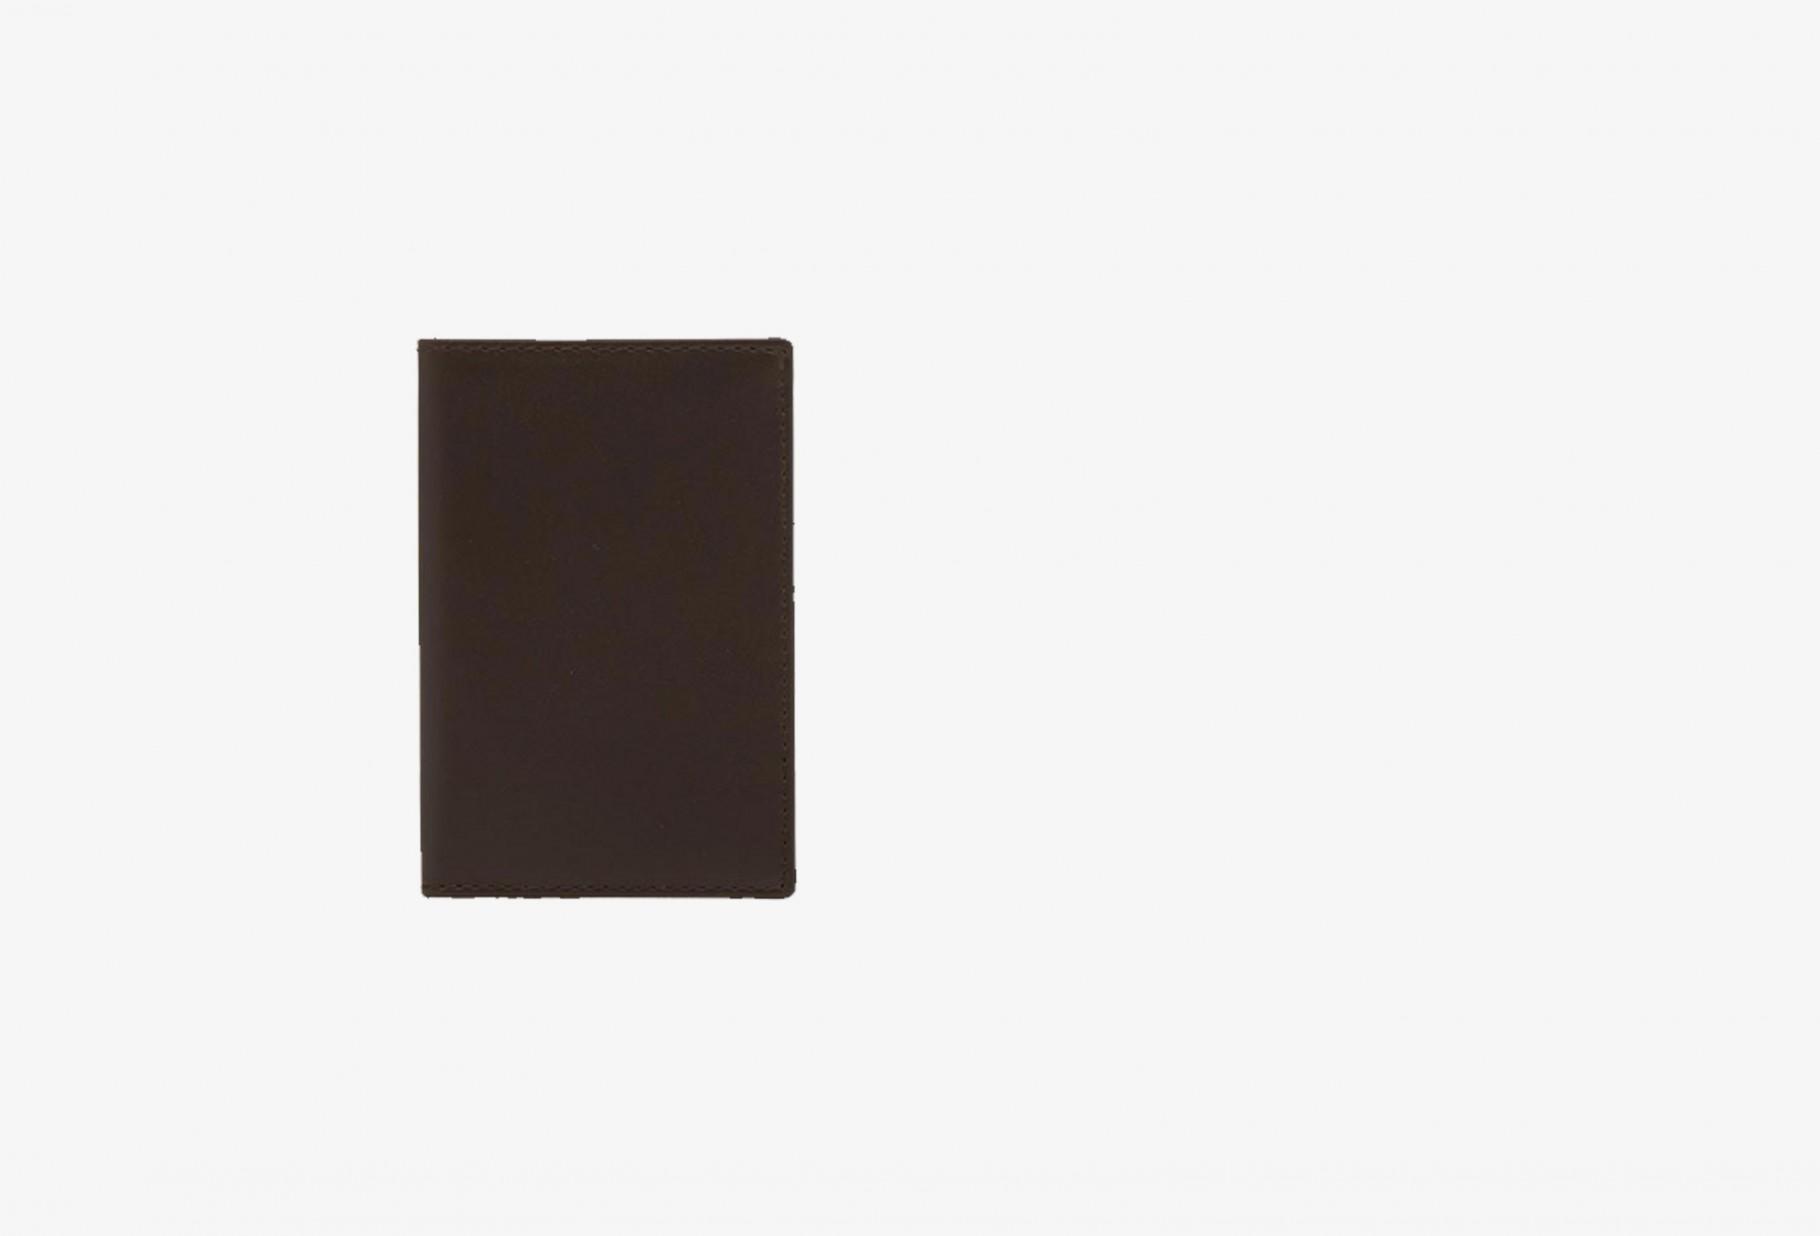 COMME DES GARÇONS WALLETS / Cdg leather wallet classic Sa6400 brown